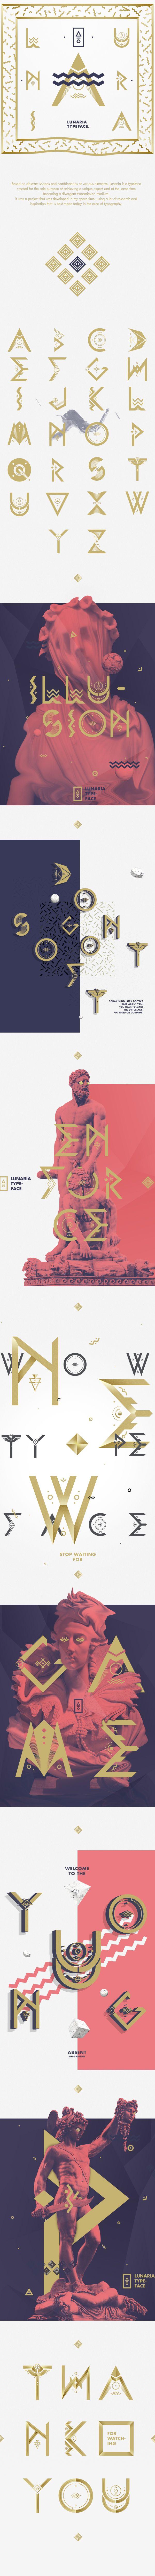 Lunaria by Vitor Braz, via Behance  Art Art director cover Artwork Visual Graphic Mixer Composition Communication Typographic Work Digital Japan Graphic Design